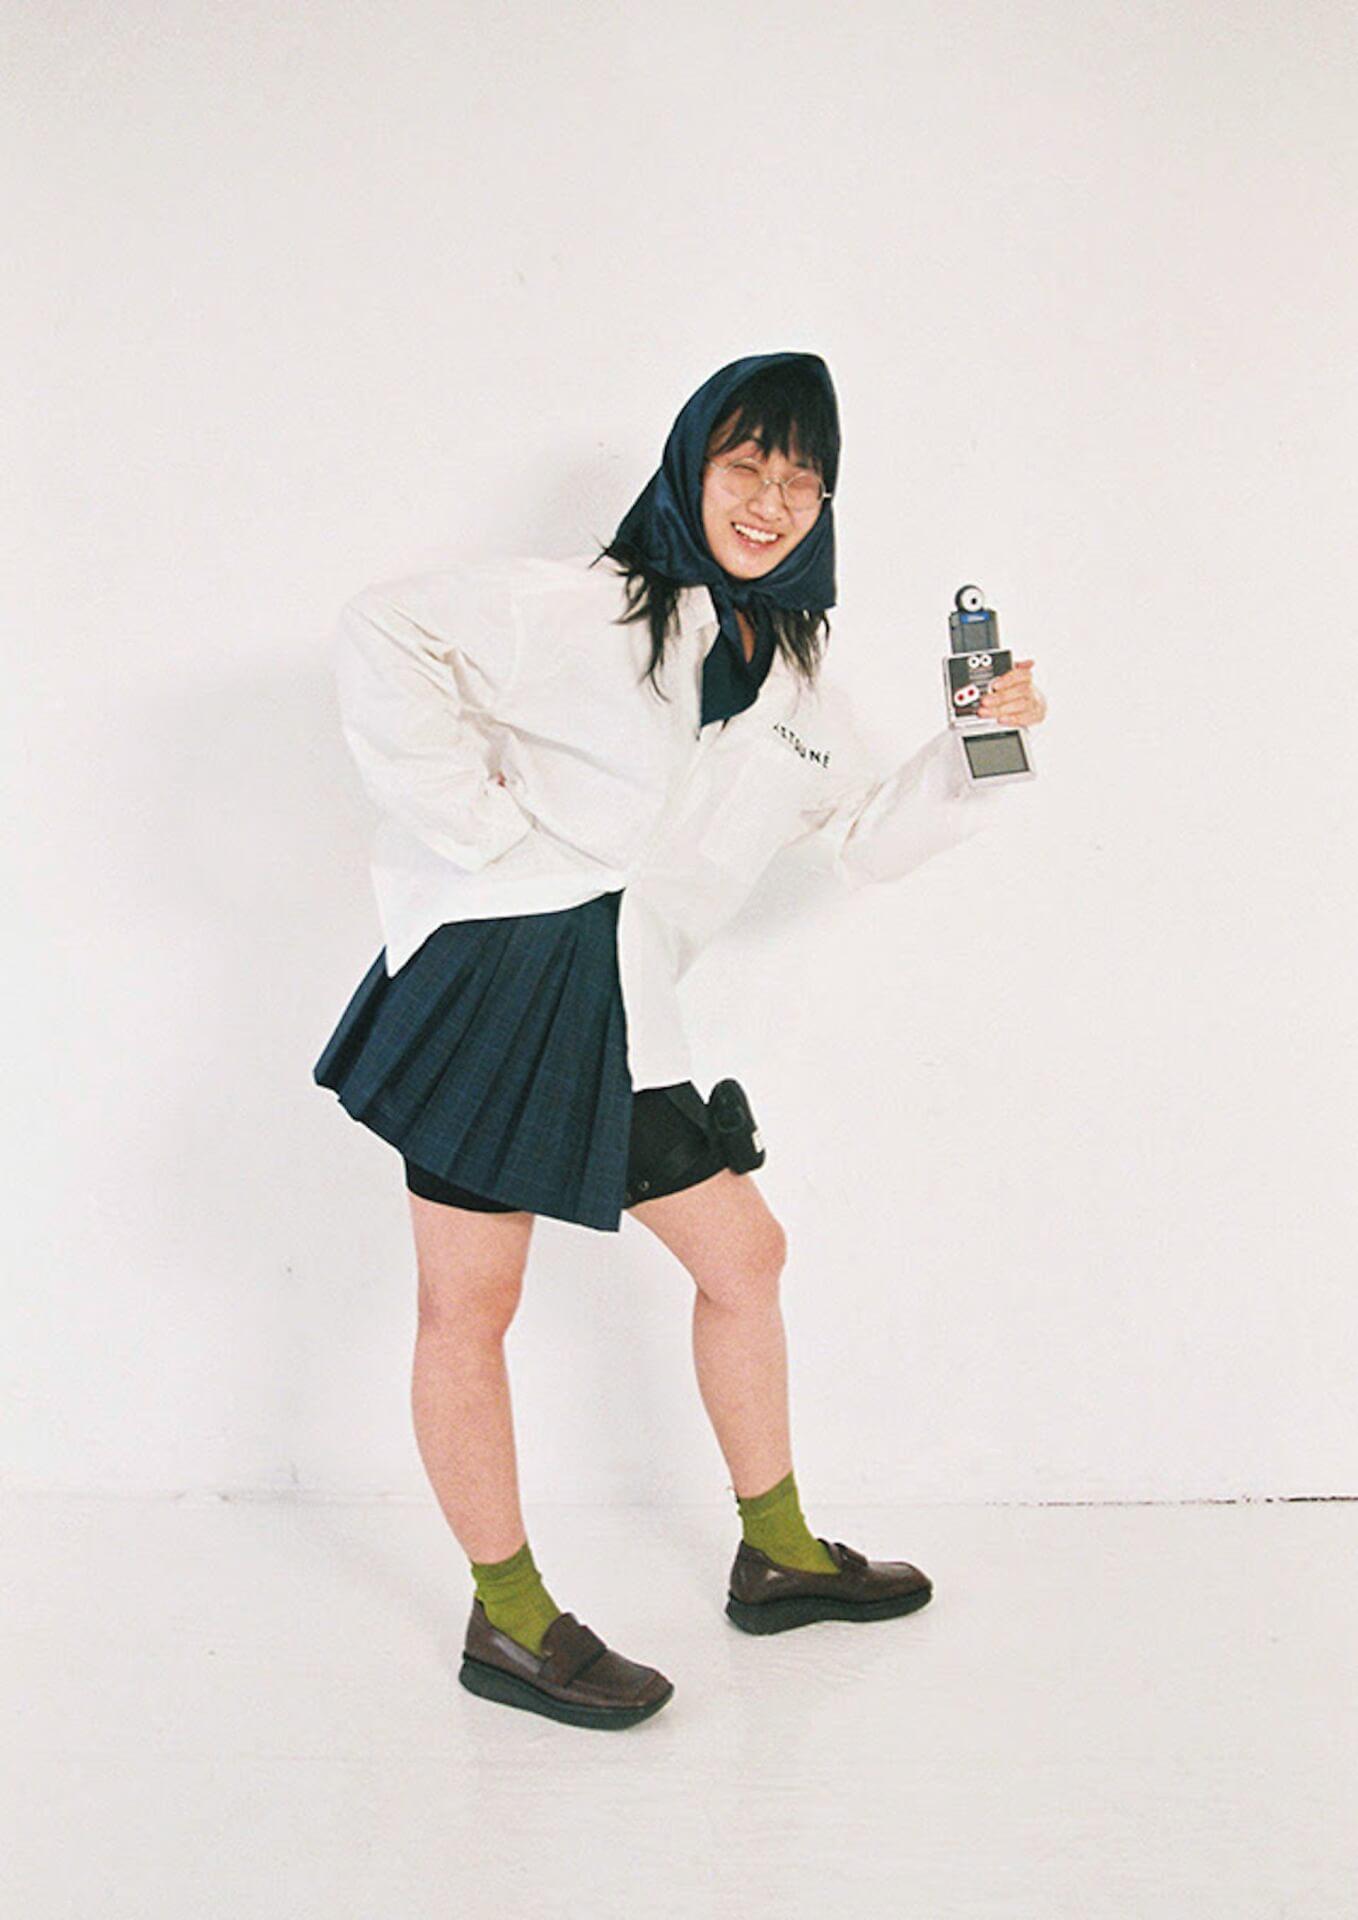 Yaejiが先着1000名限定オンラインパーティーをClub Quarantineにて開催!本人のInstagramにて詳細発表 music200508_yaeji_01